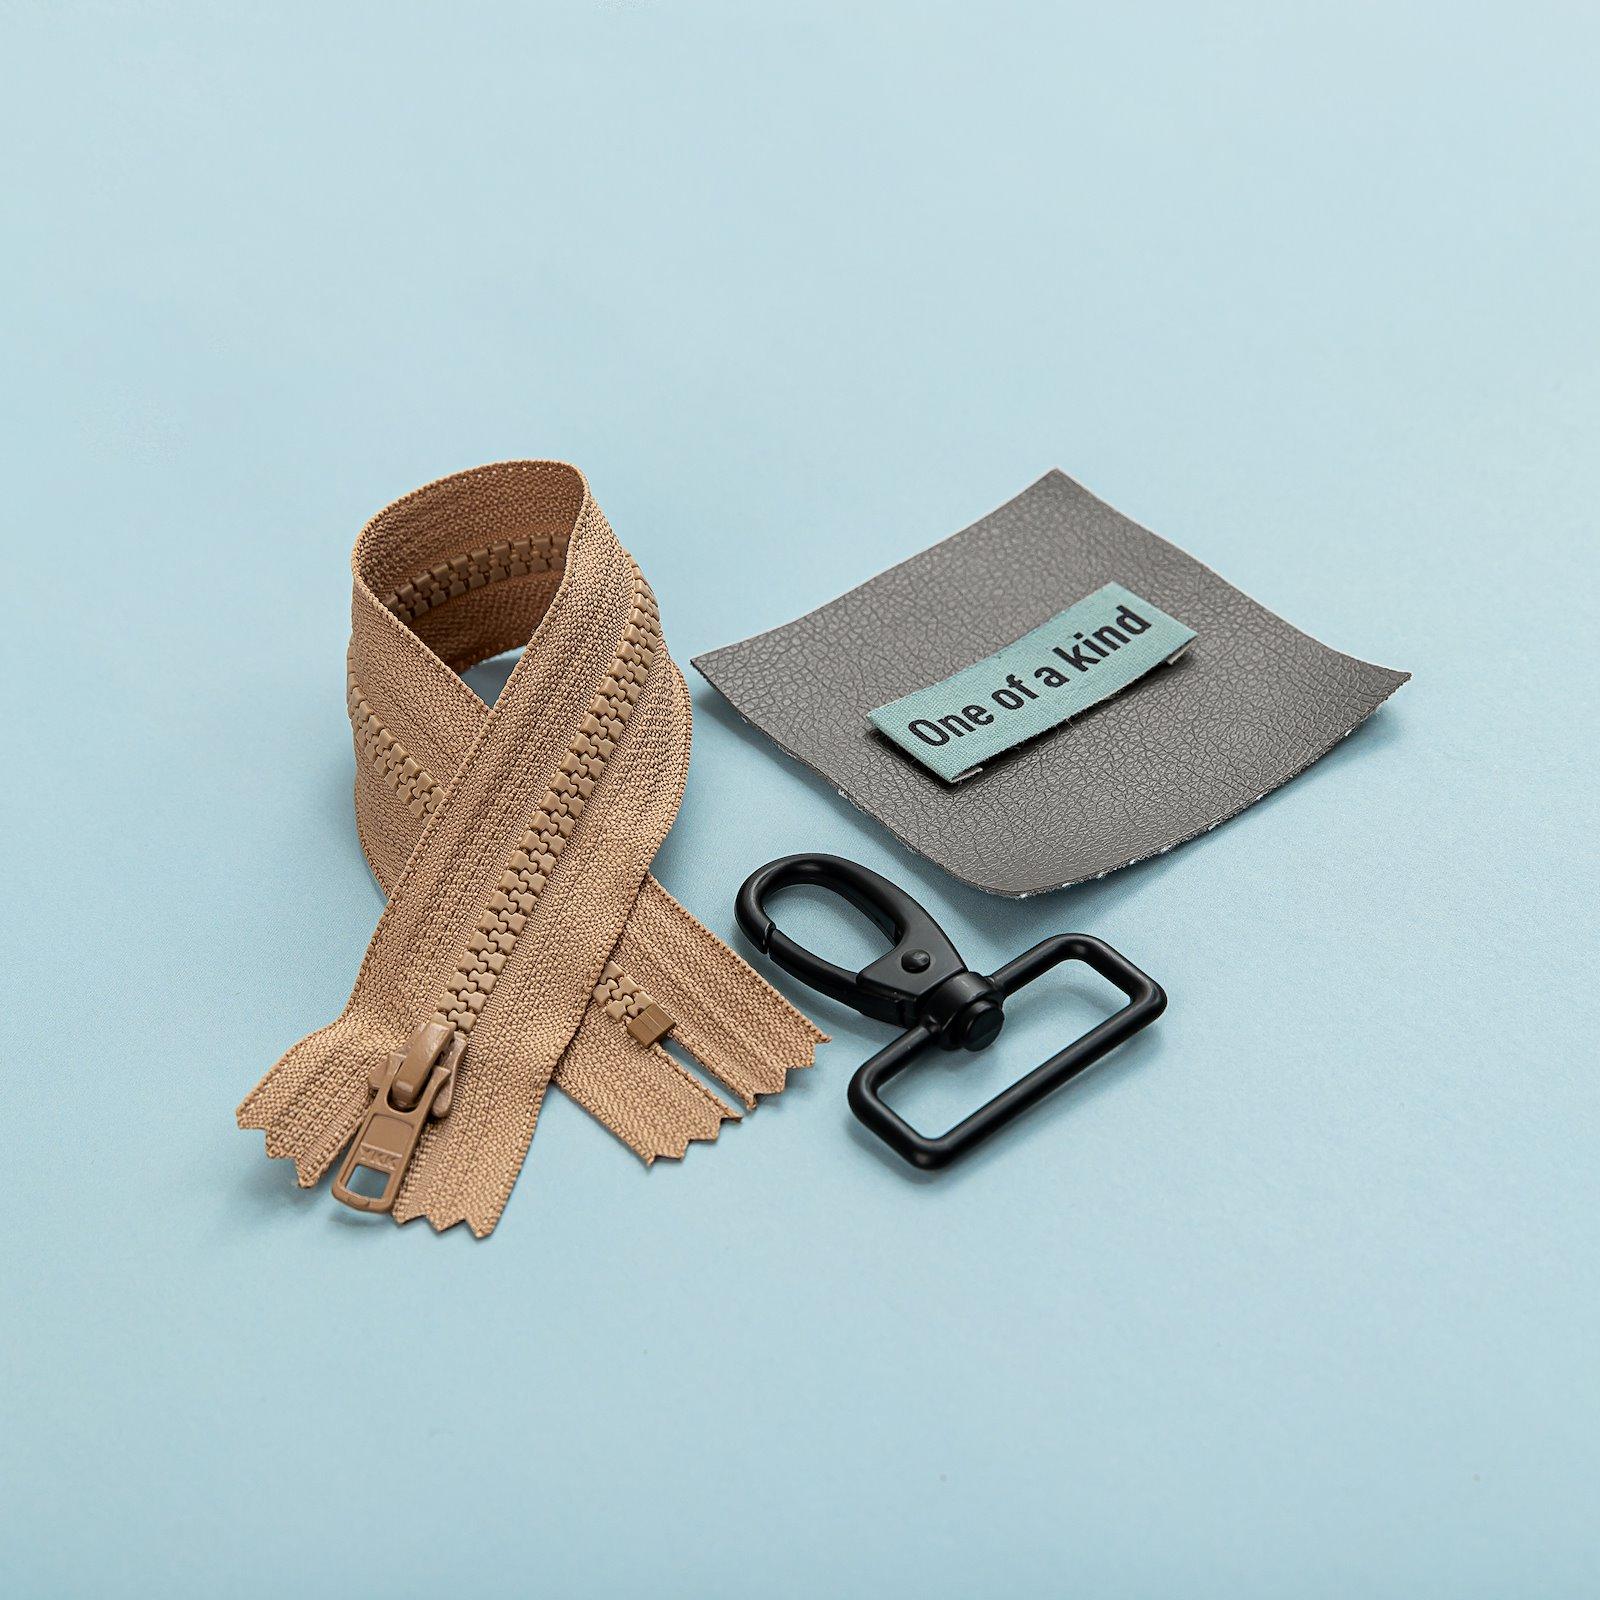 YKK zip 6mm closed end dark beige z50130_45109_24872_823965_bundle